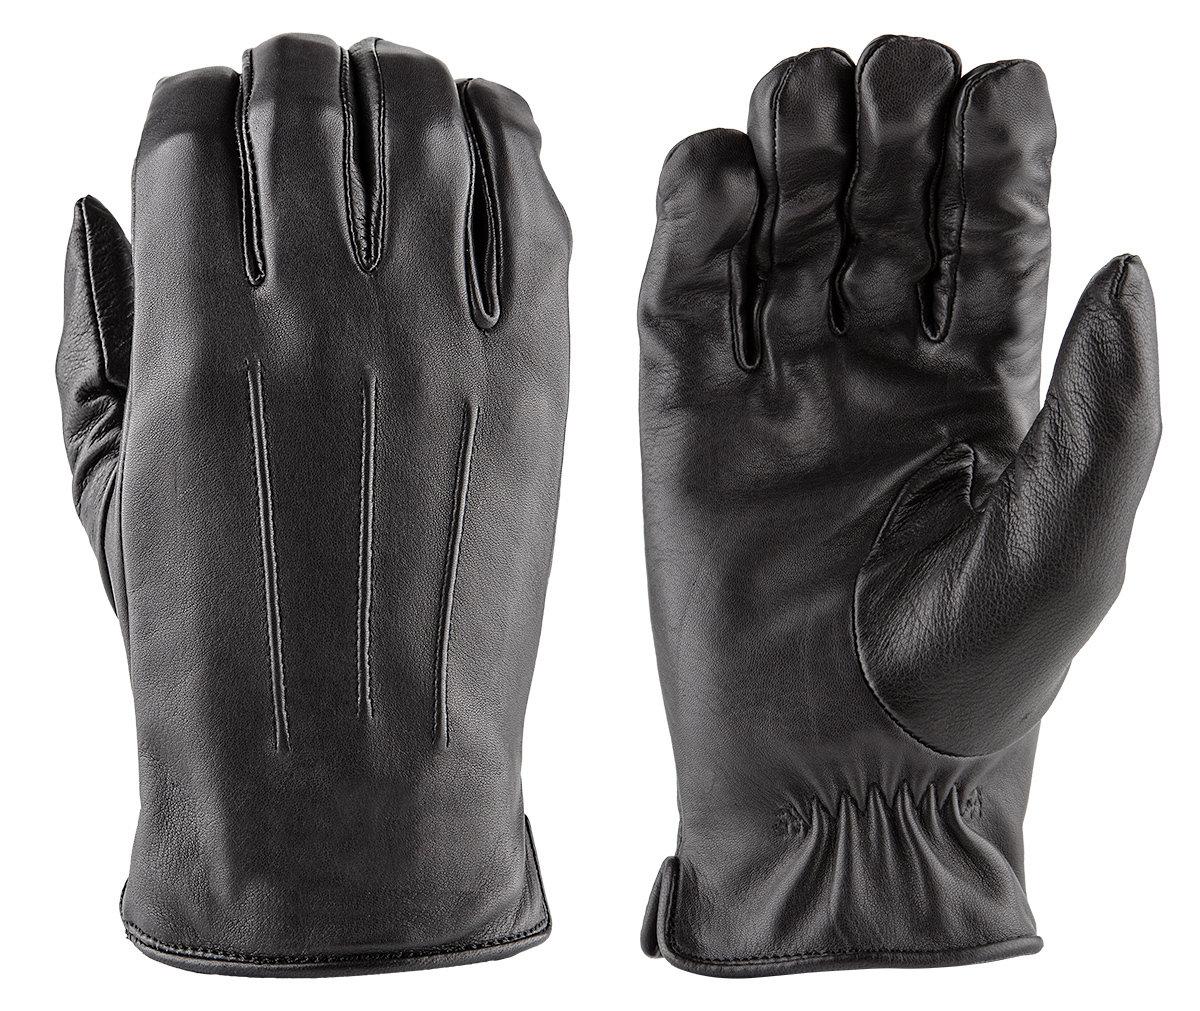 LUXE Deer Skin Leather Gloves w/ Faux Fur Lining DLD50-LX